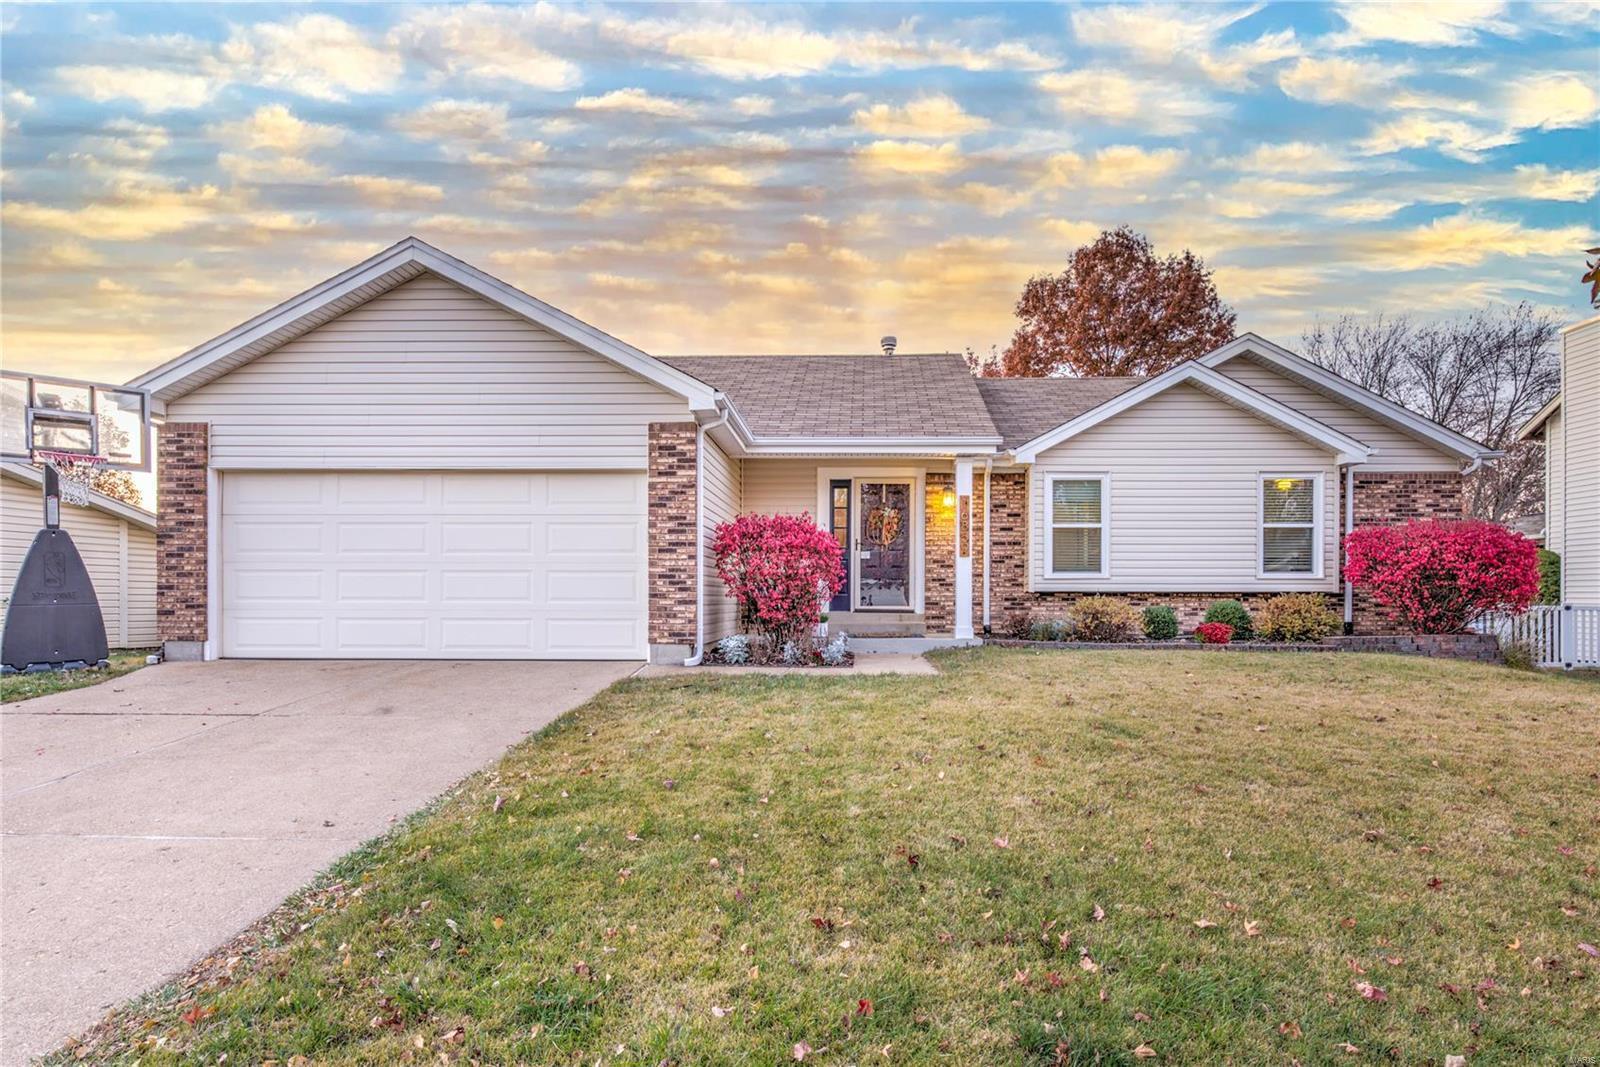 16859 Babler View Property Photo - Wildwood, MO real estate listing